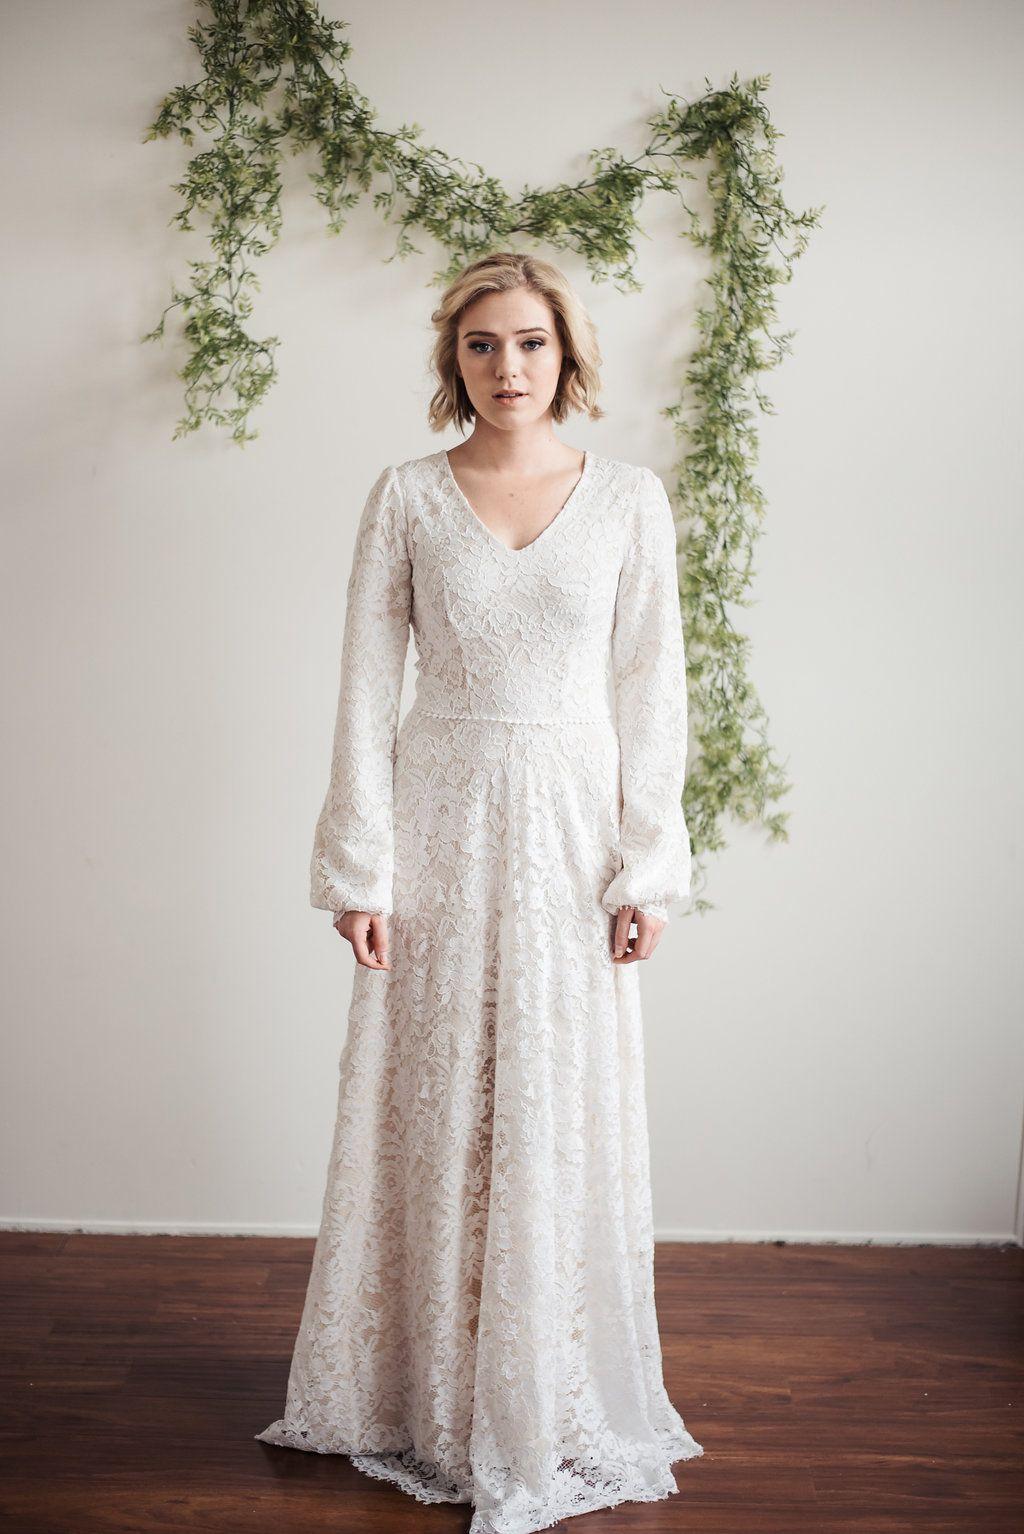 Hydrangea hydrangea dress dresses fashion